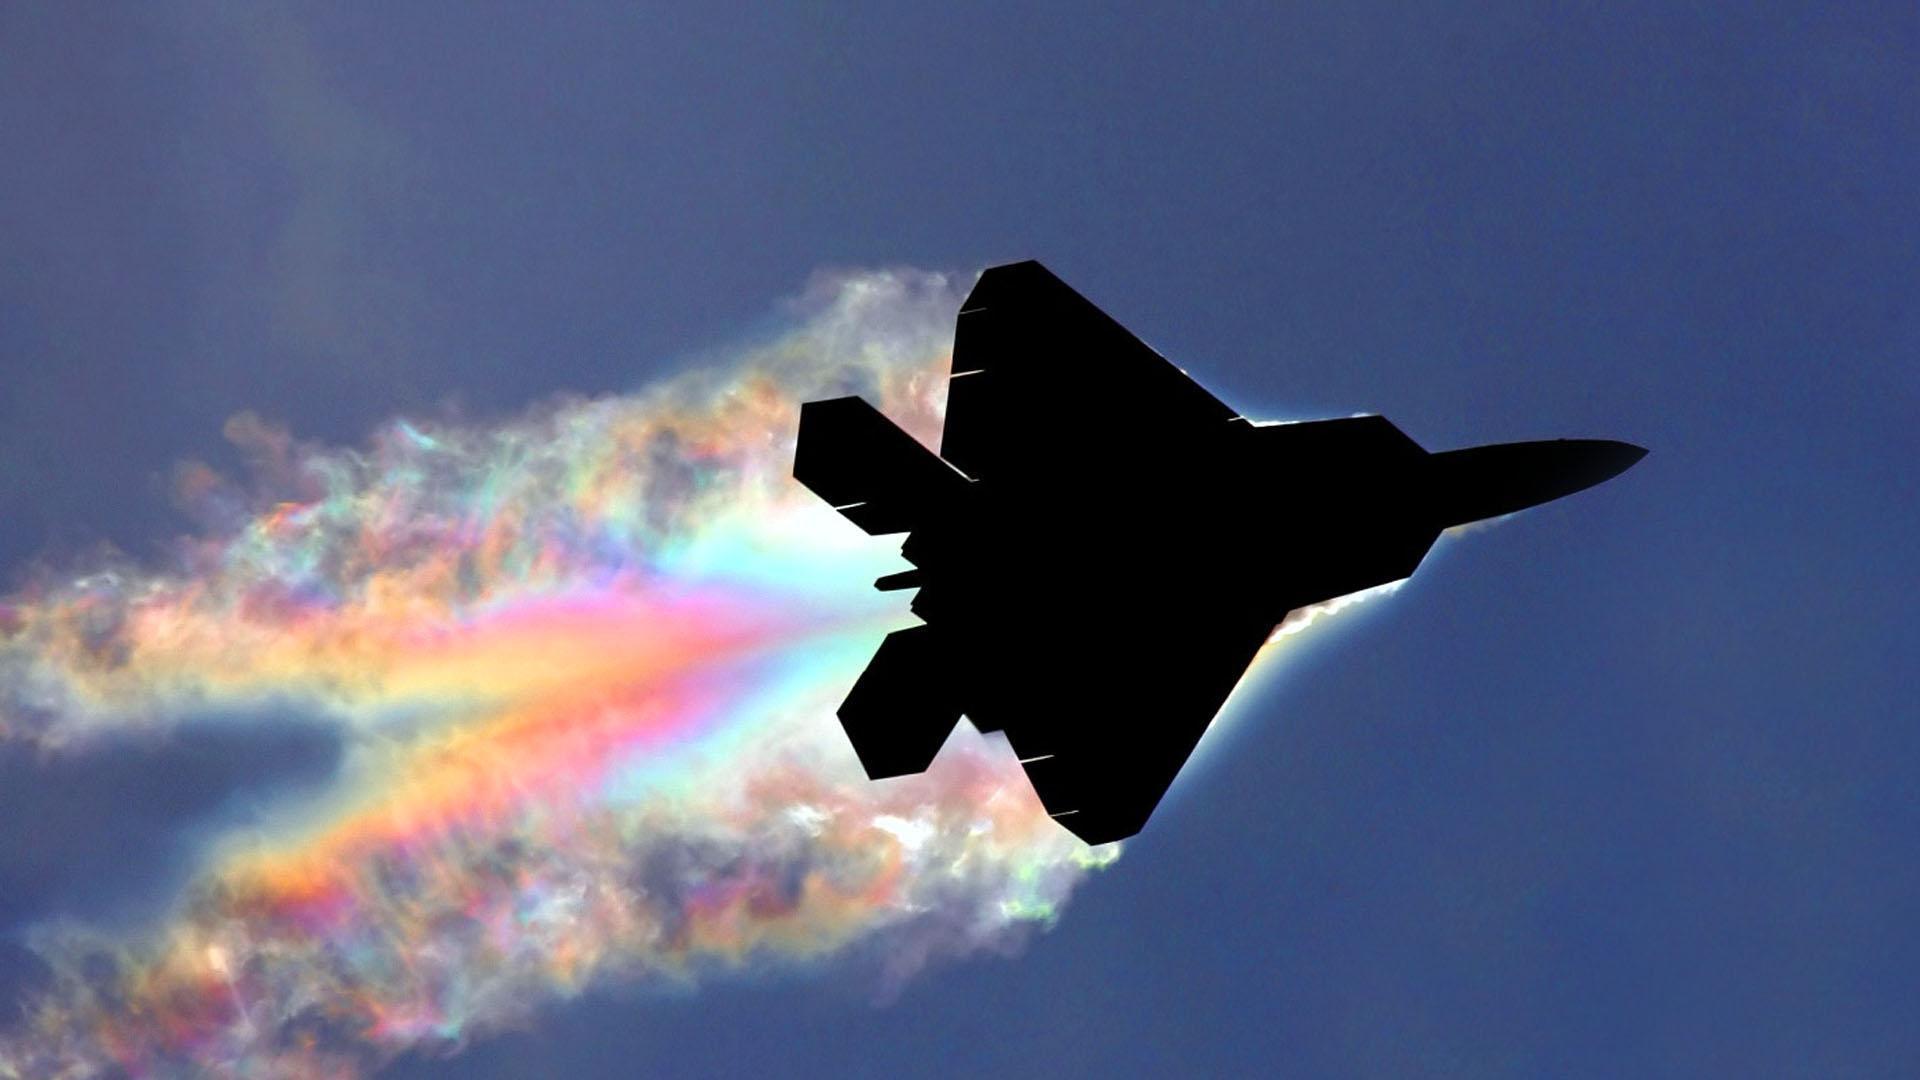 Lockheed Martin F-22 Raptor wallpapers HD quality